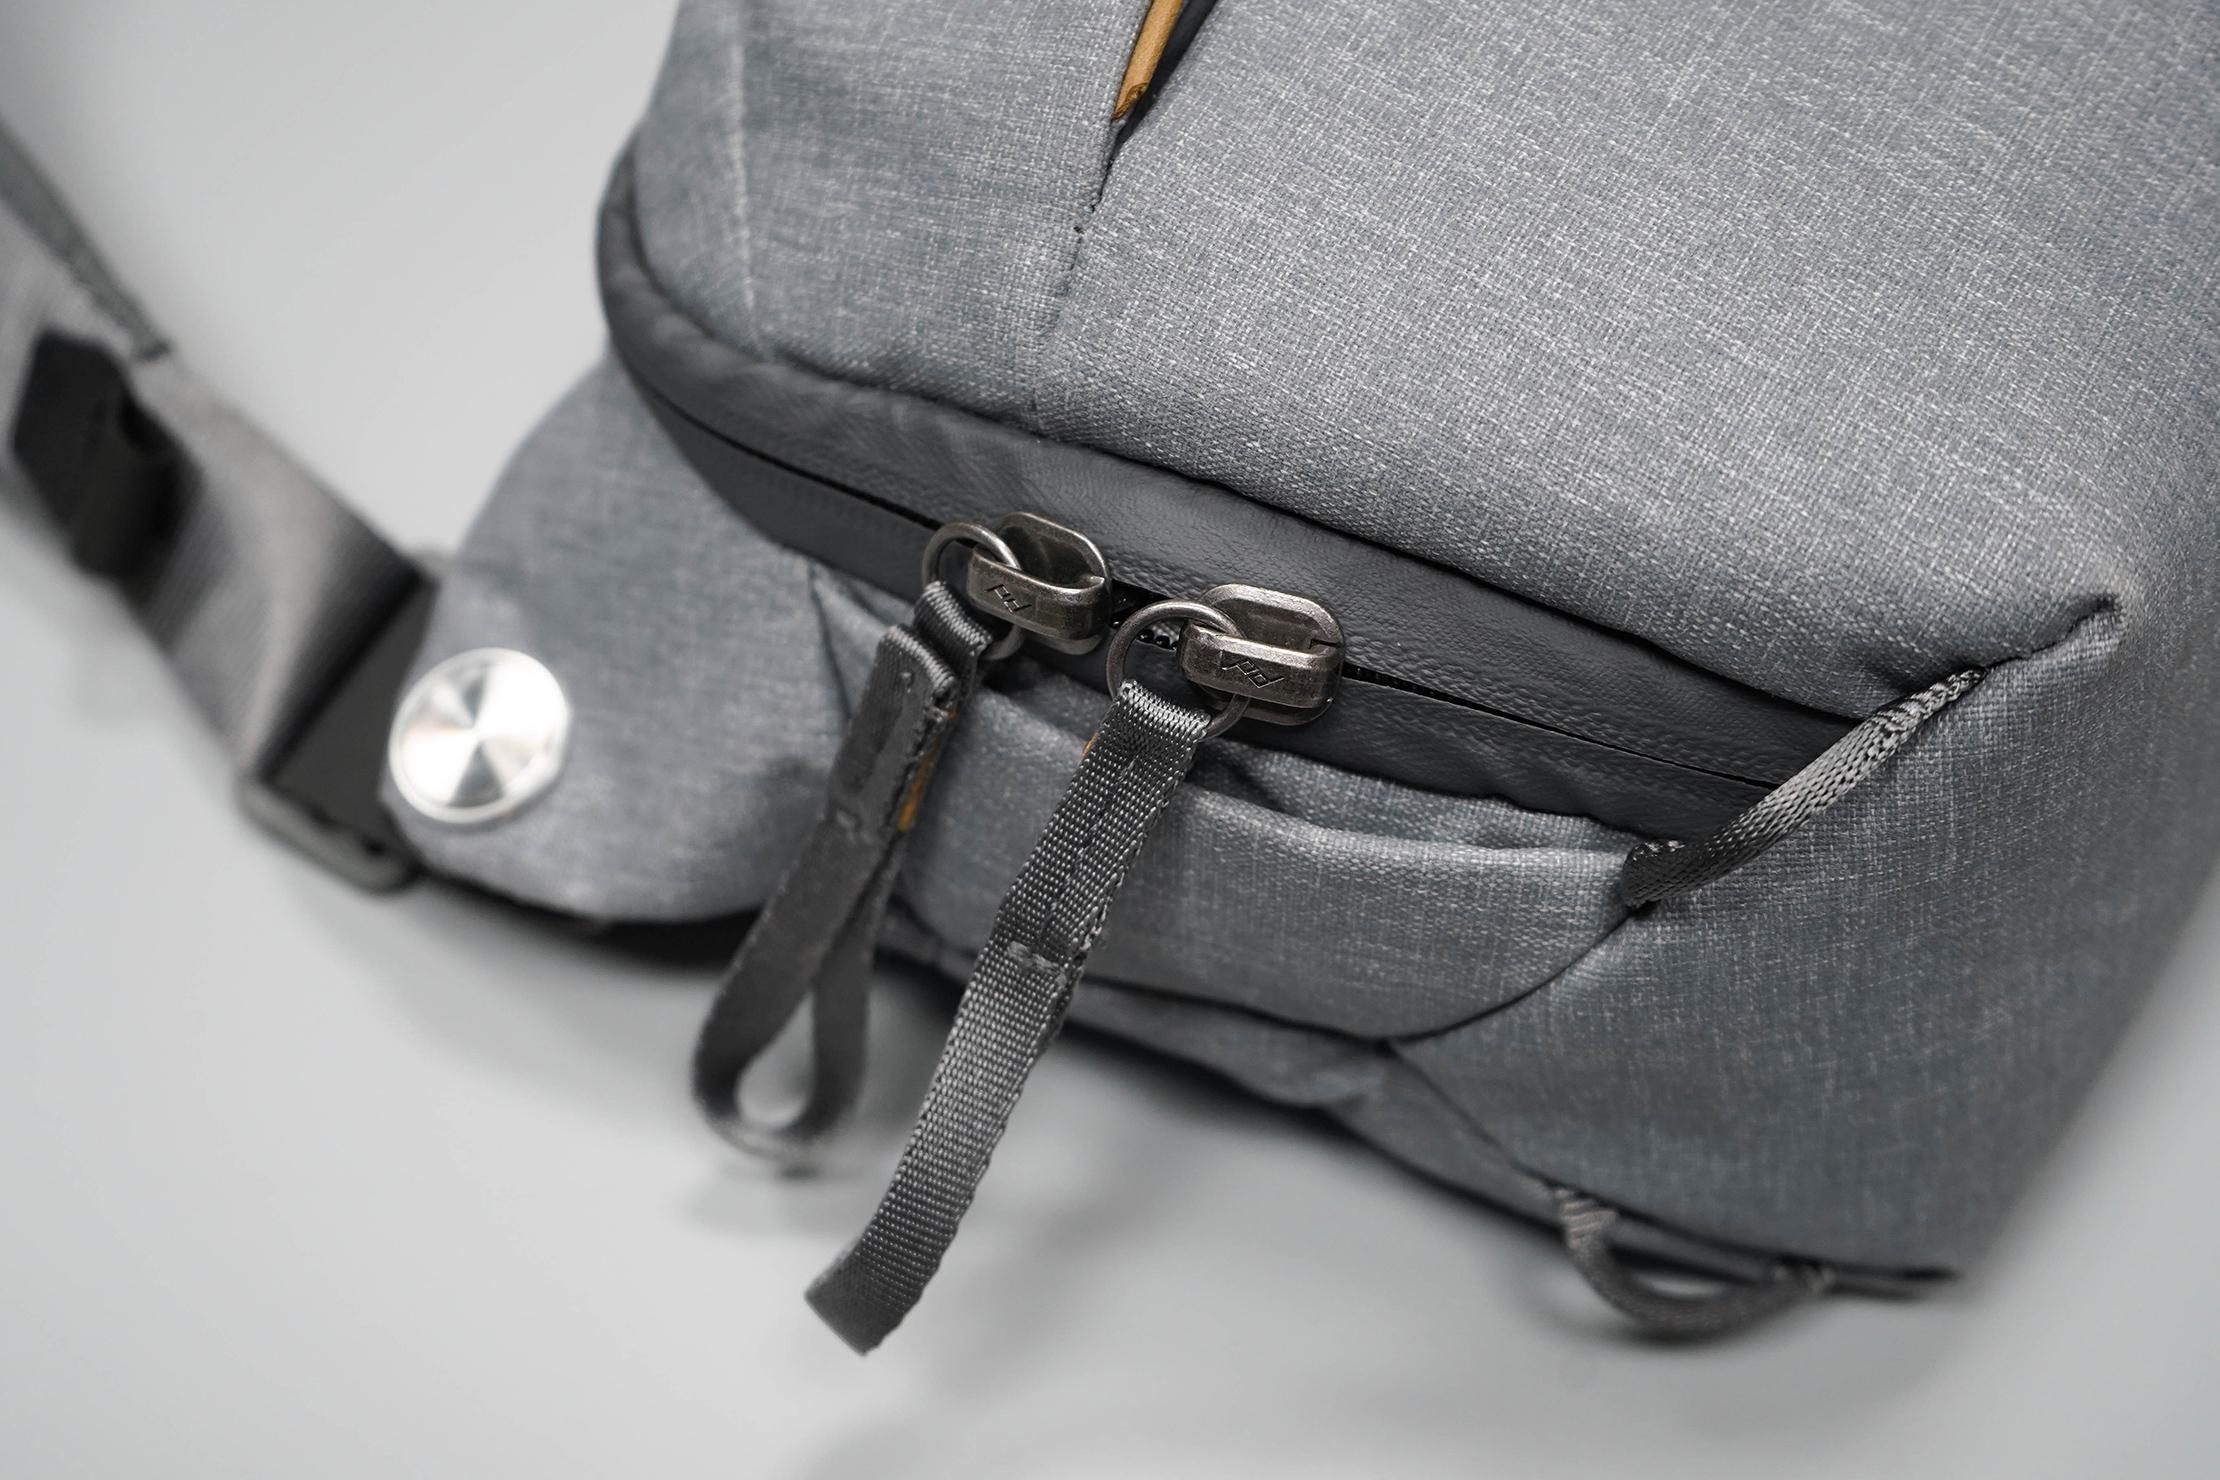 Peak Design Everyday Sling 3L V2 Zippers